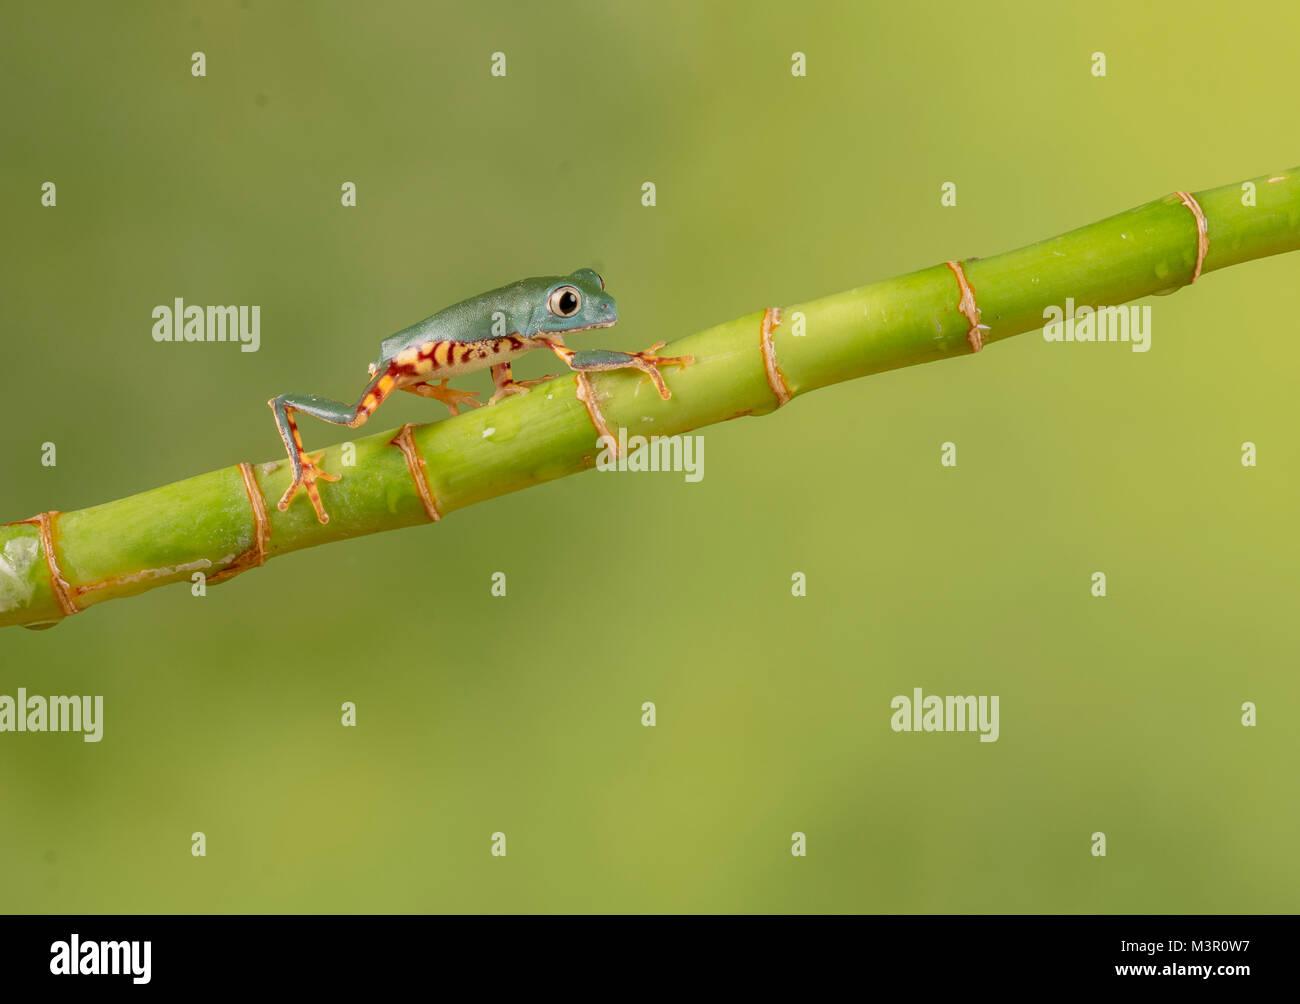 Little frog walking up bamboo Stock Photo